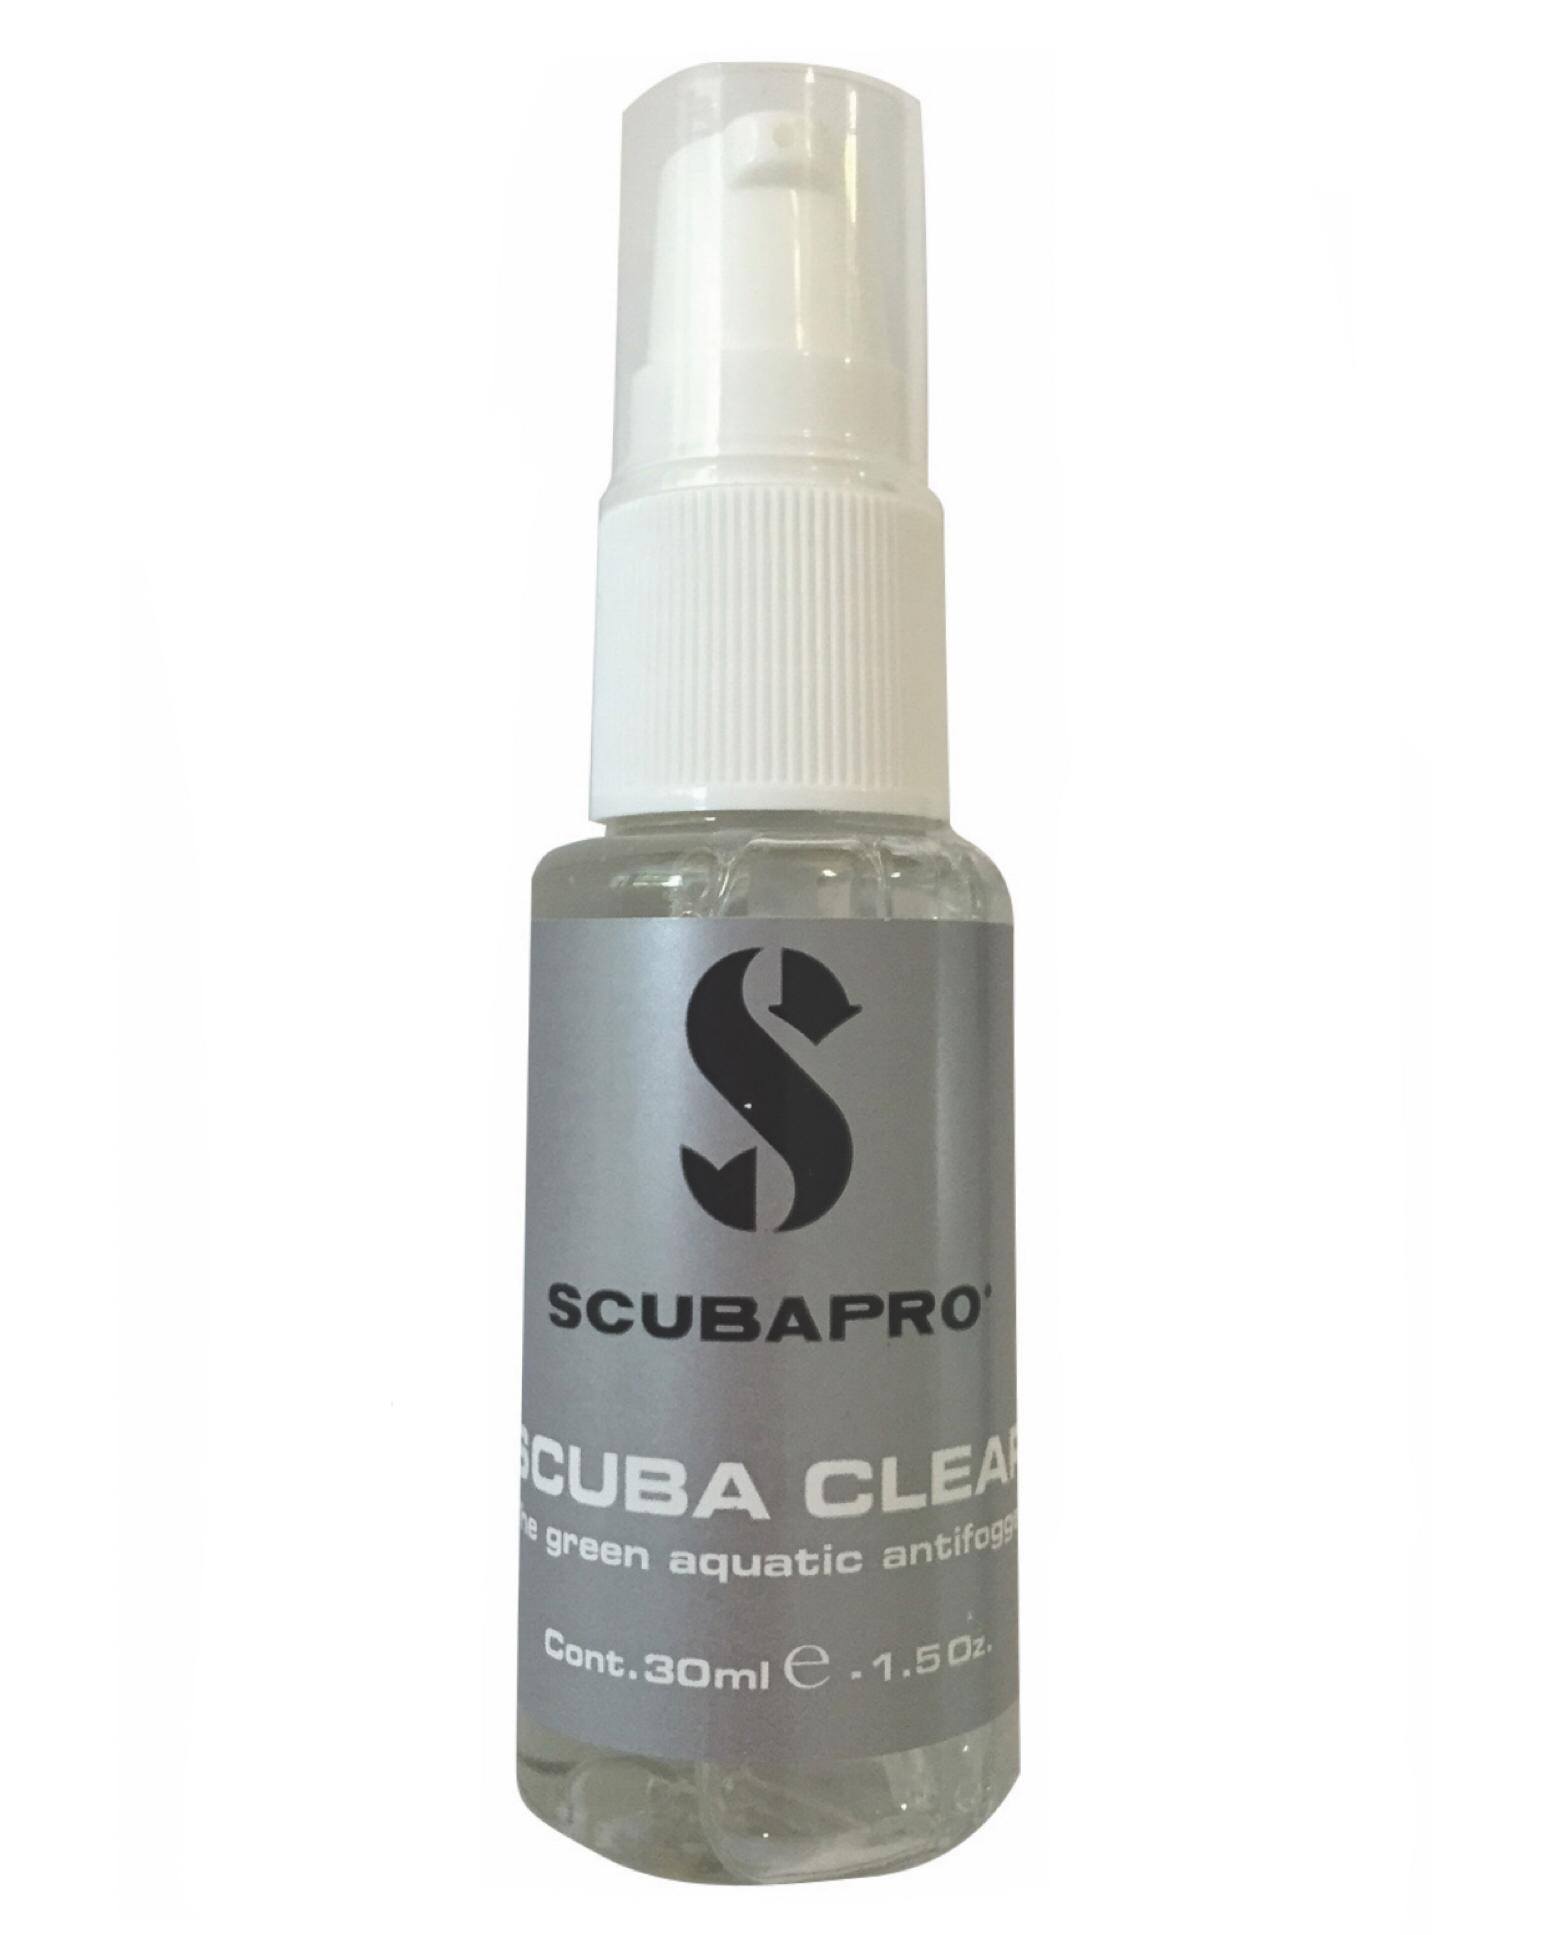 Scubaclear1